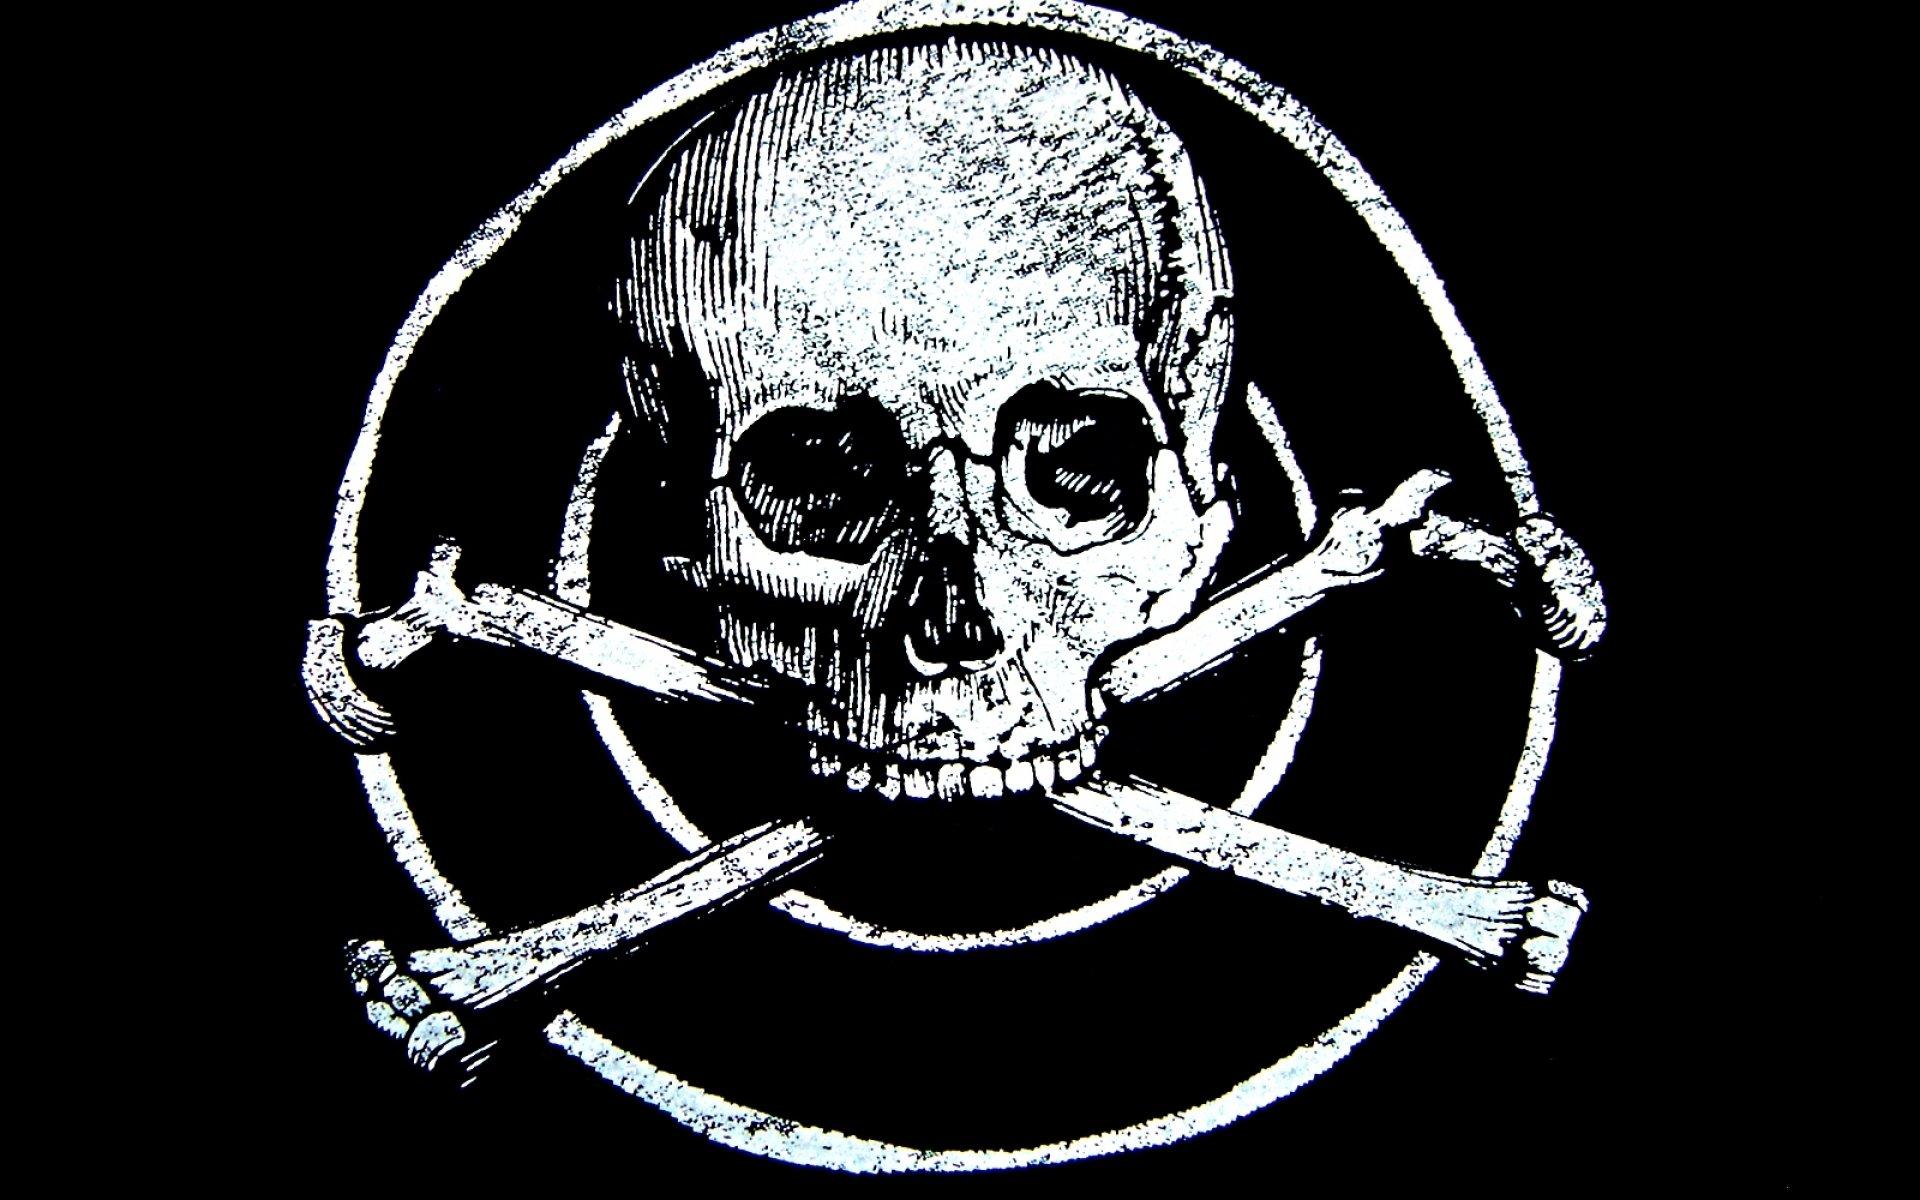 Dark skull evil horror...